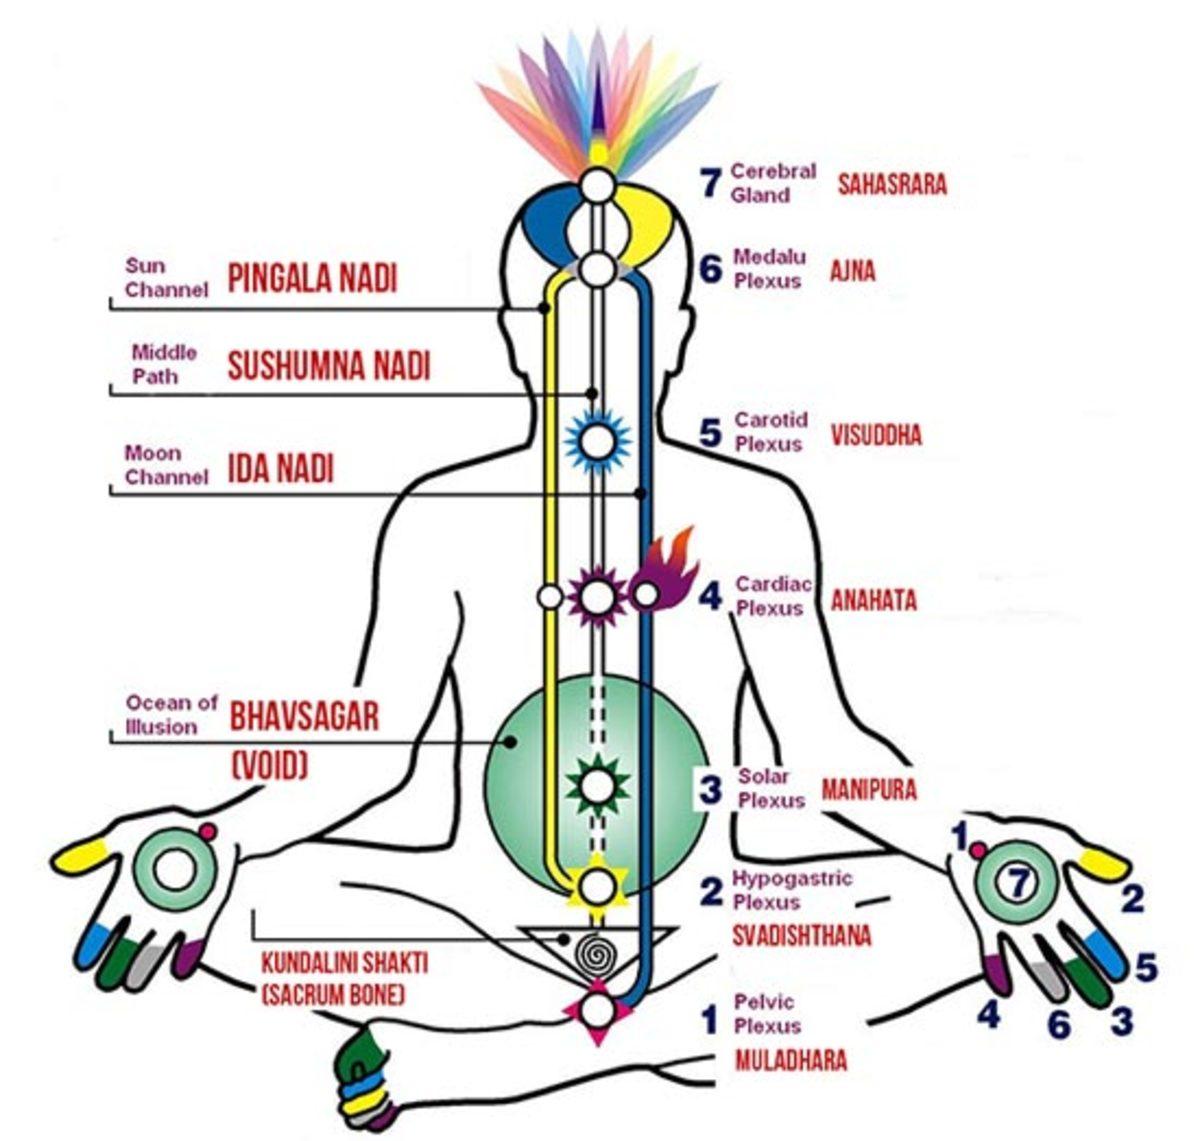 Kundalini energy flow from Mooladhara to Sahasrara through Sushumna Nadi